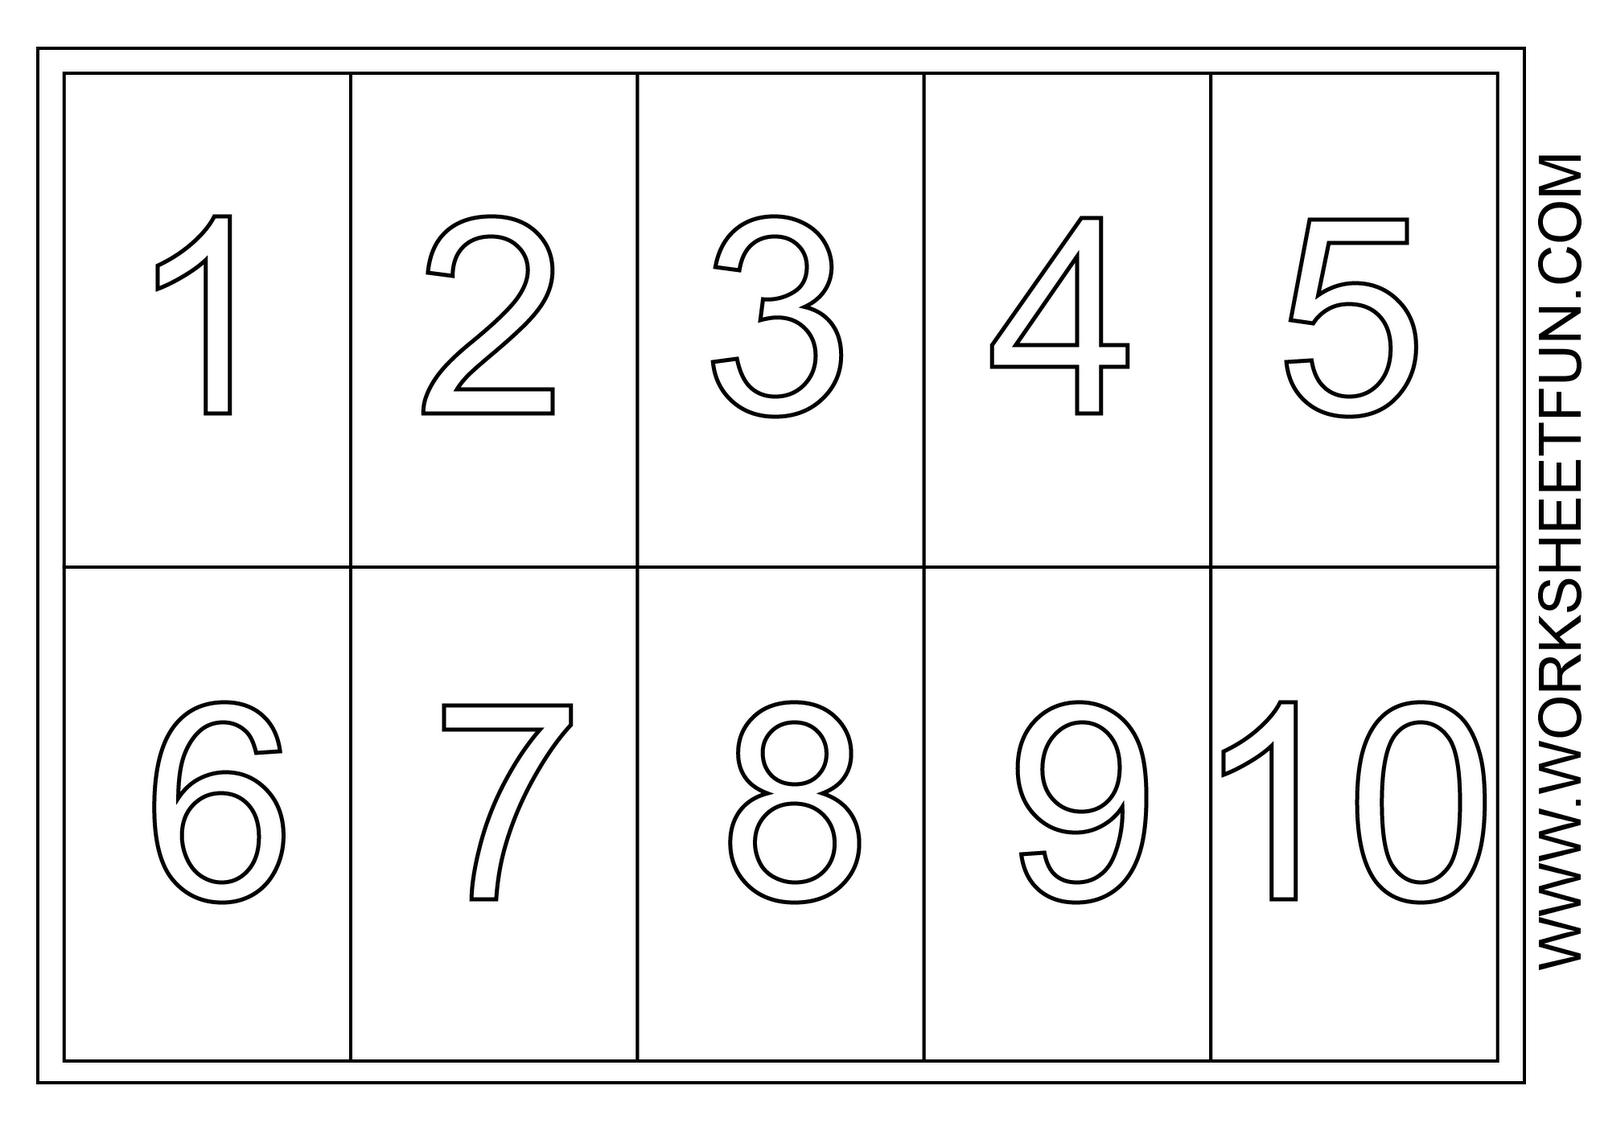 Printable Coloring Numbers 1 10 Printable Pinterest Coloring Numbers 1 10